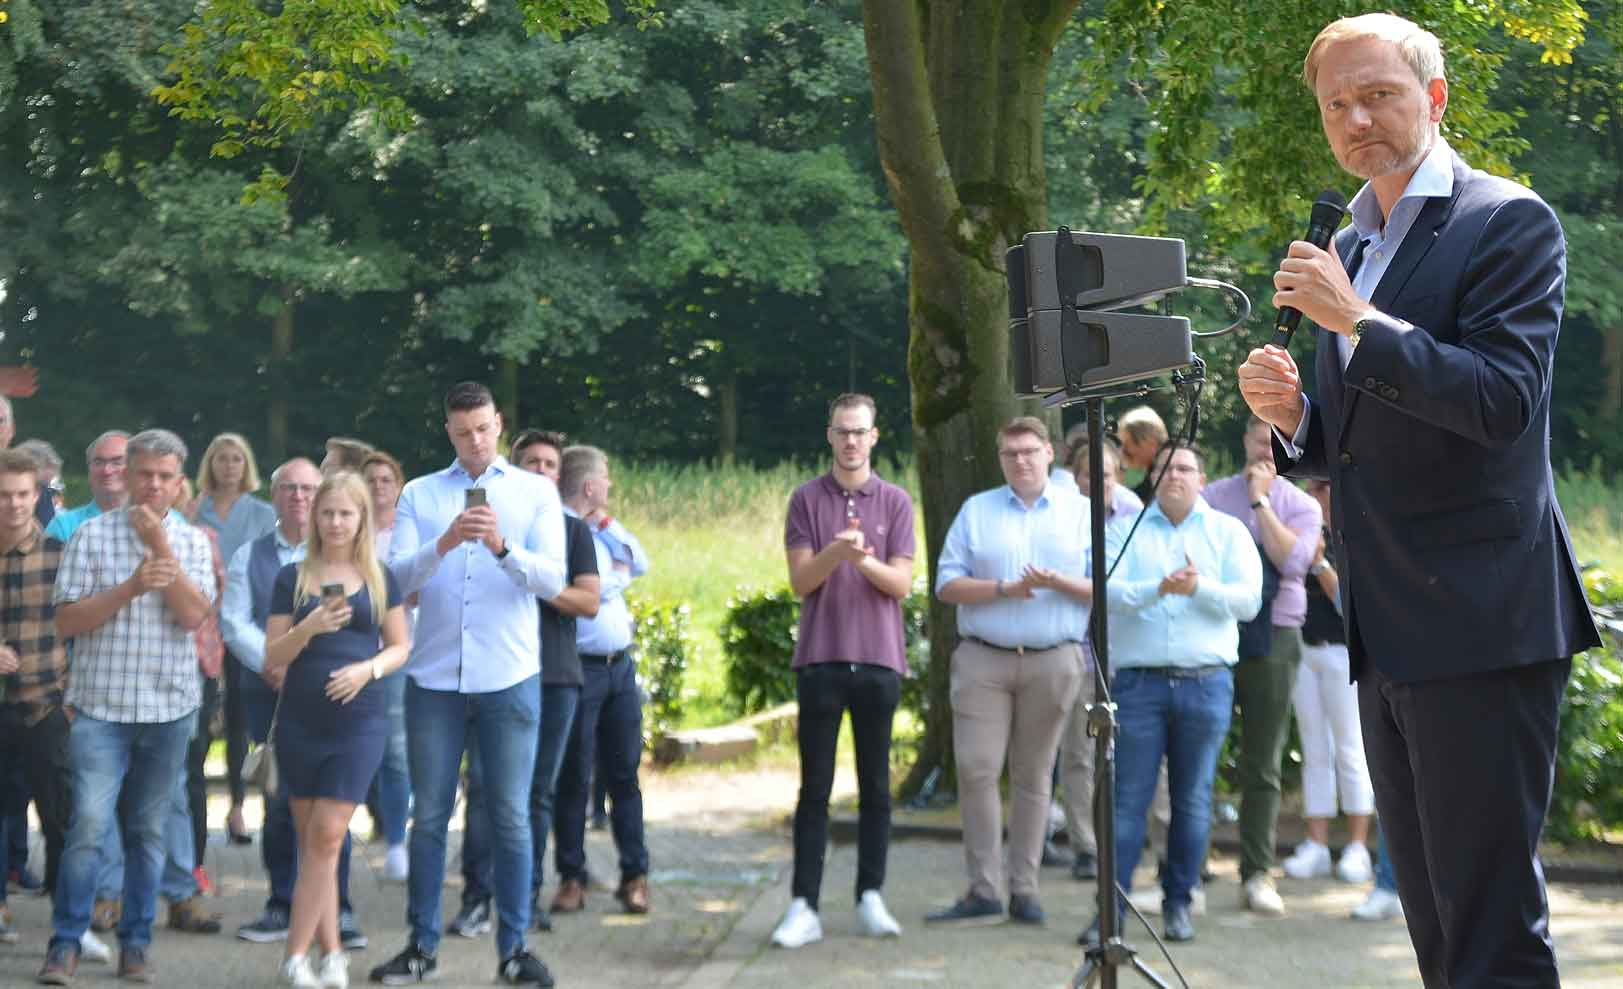 Wahlkampfrede-Christian-Lindner-Raesfeld